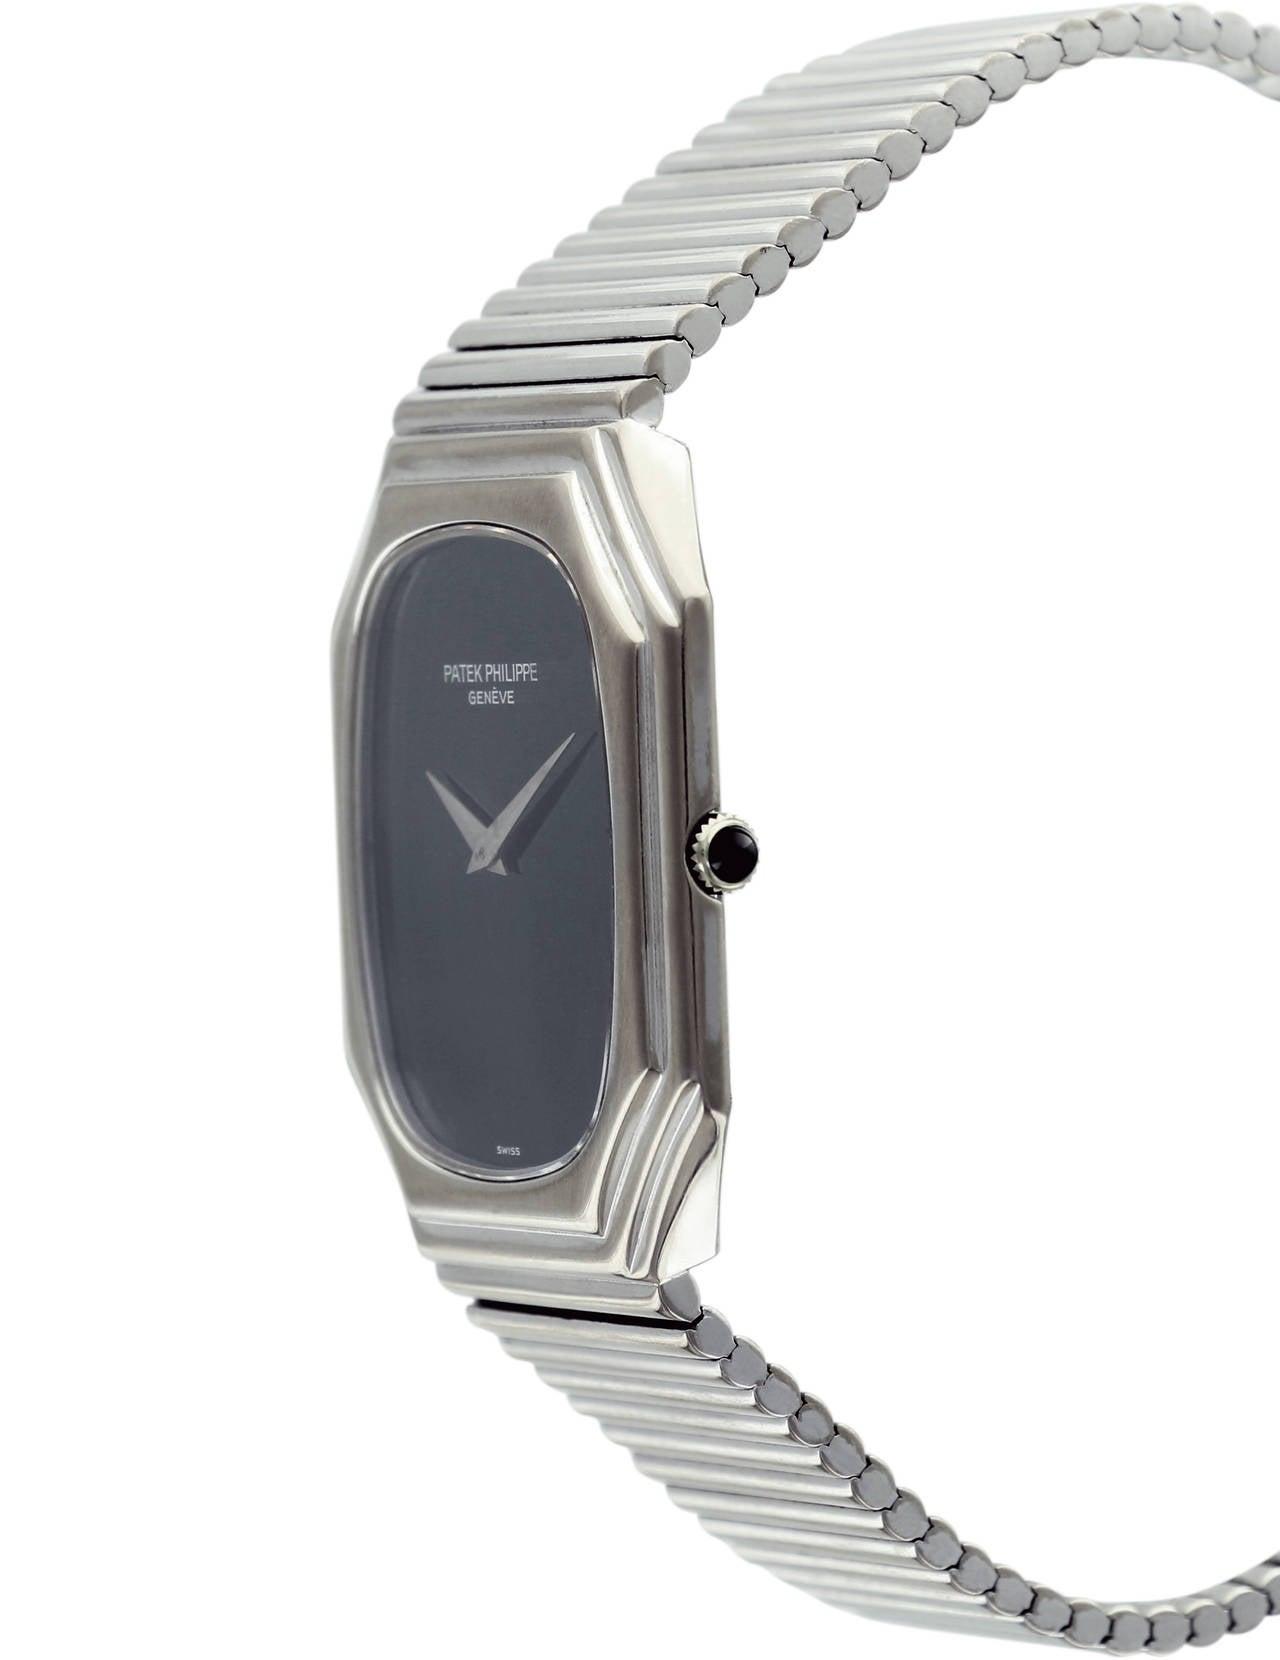 Patek Philippe White Gold Black Dial Wristwatch Ref 3729 3